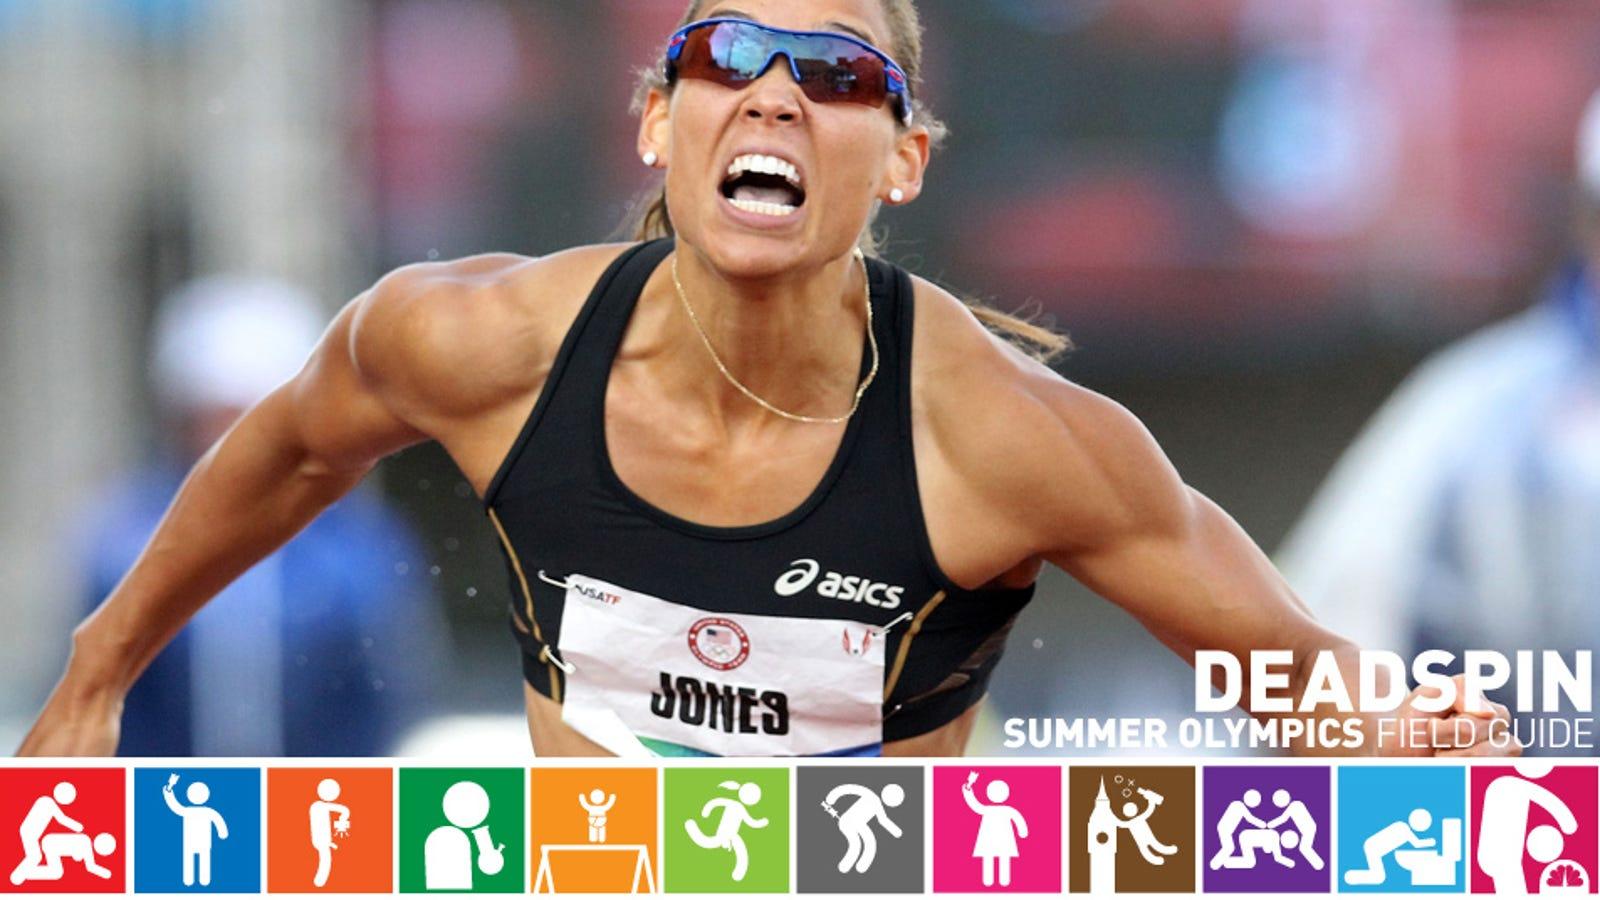 Olympics Field Guide: Lolo Jones, The 29-Year-Old Virgin ...